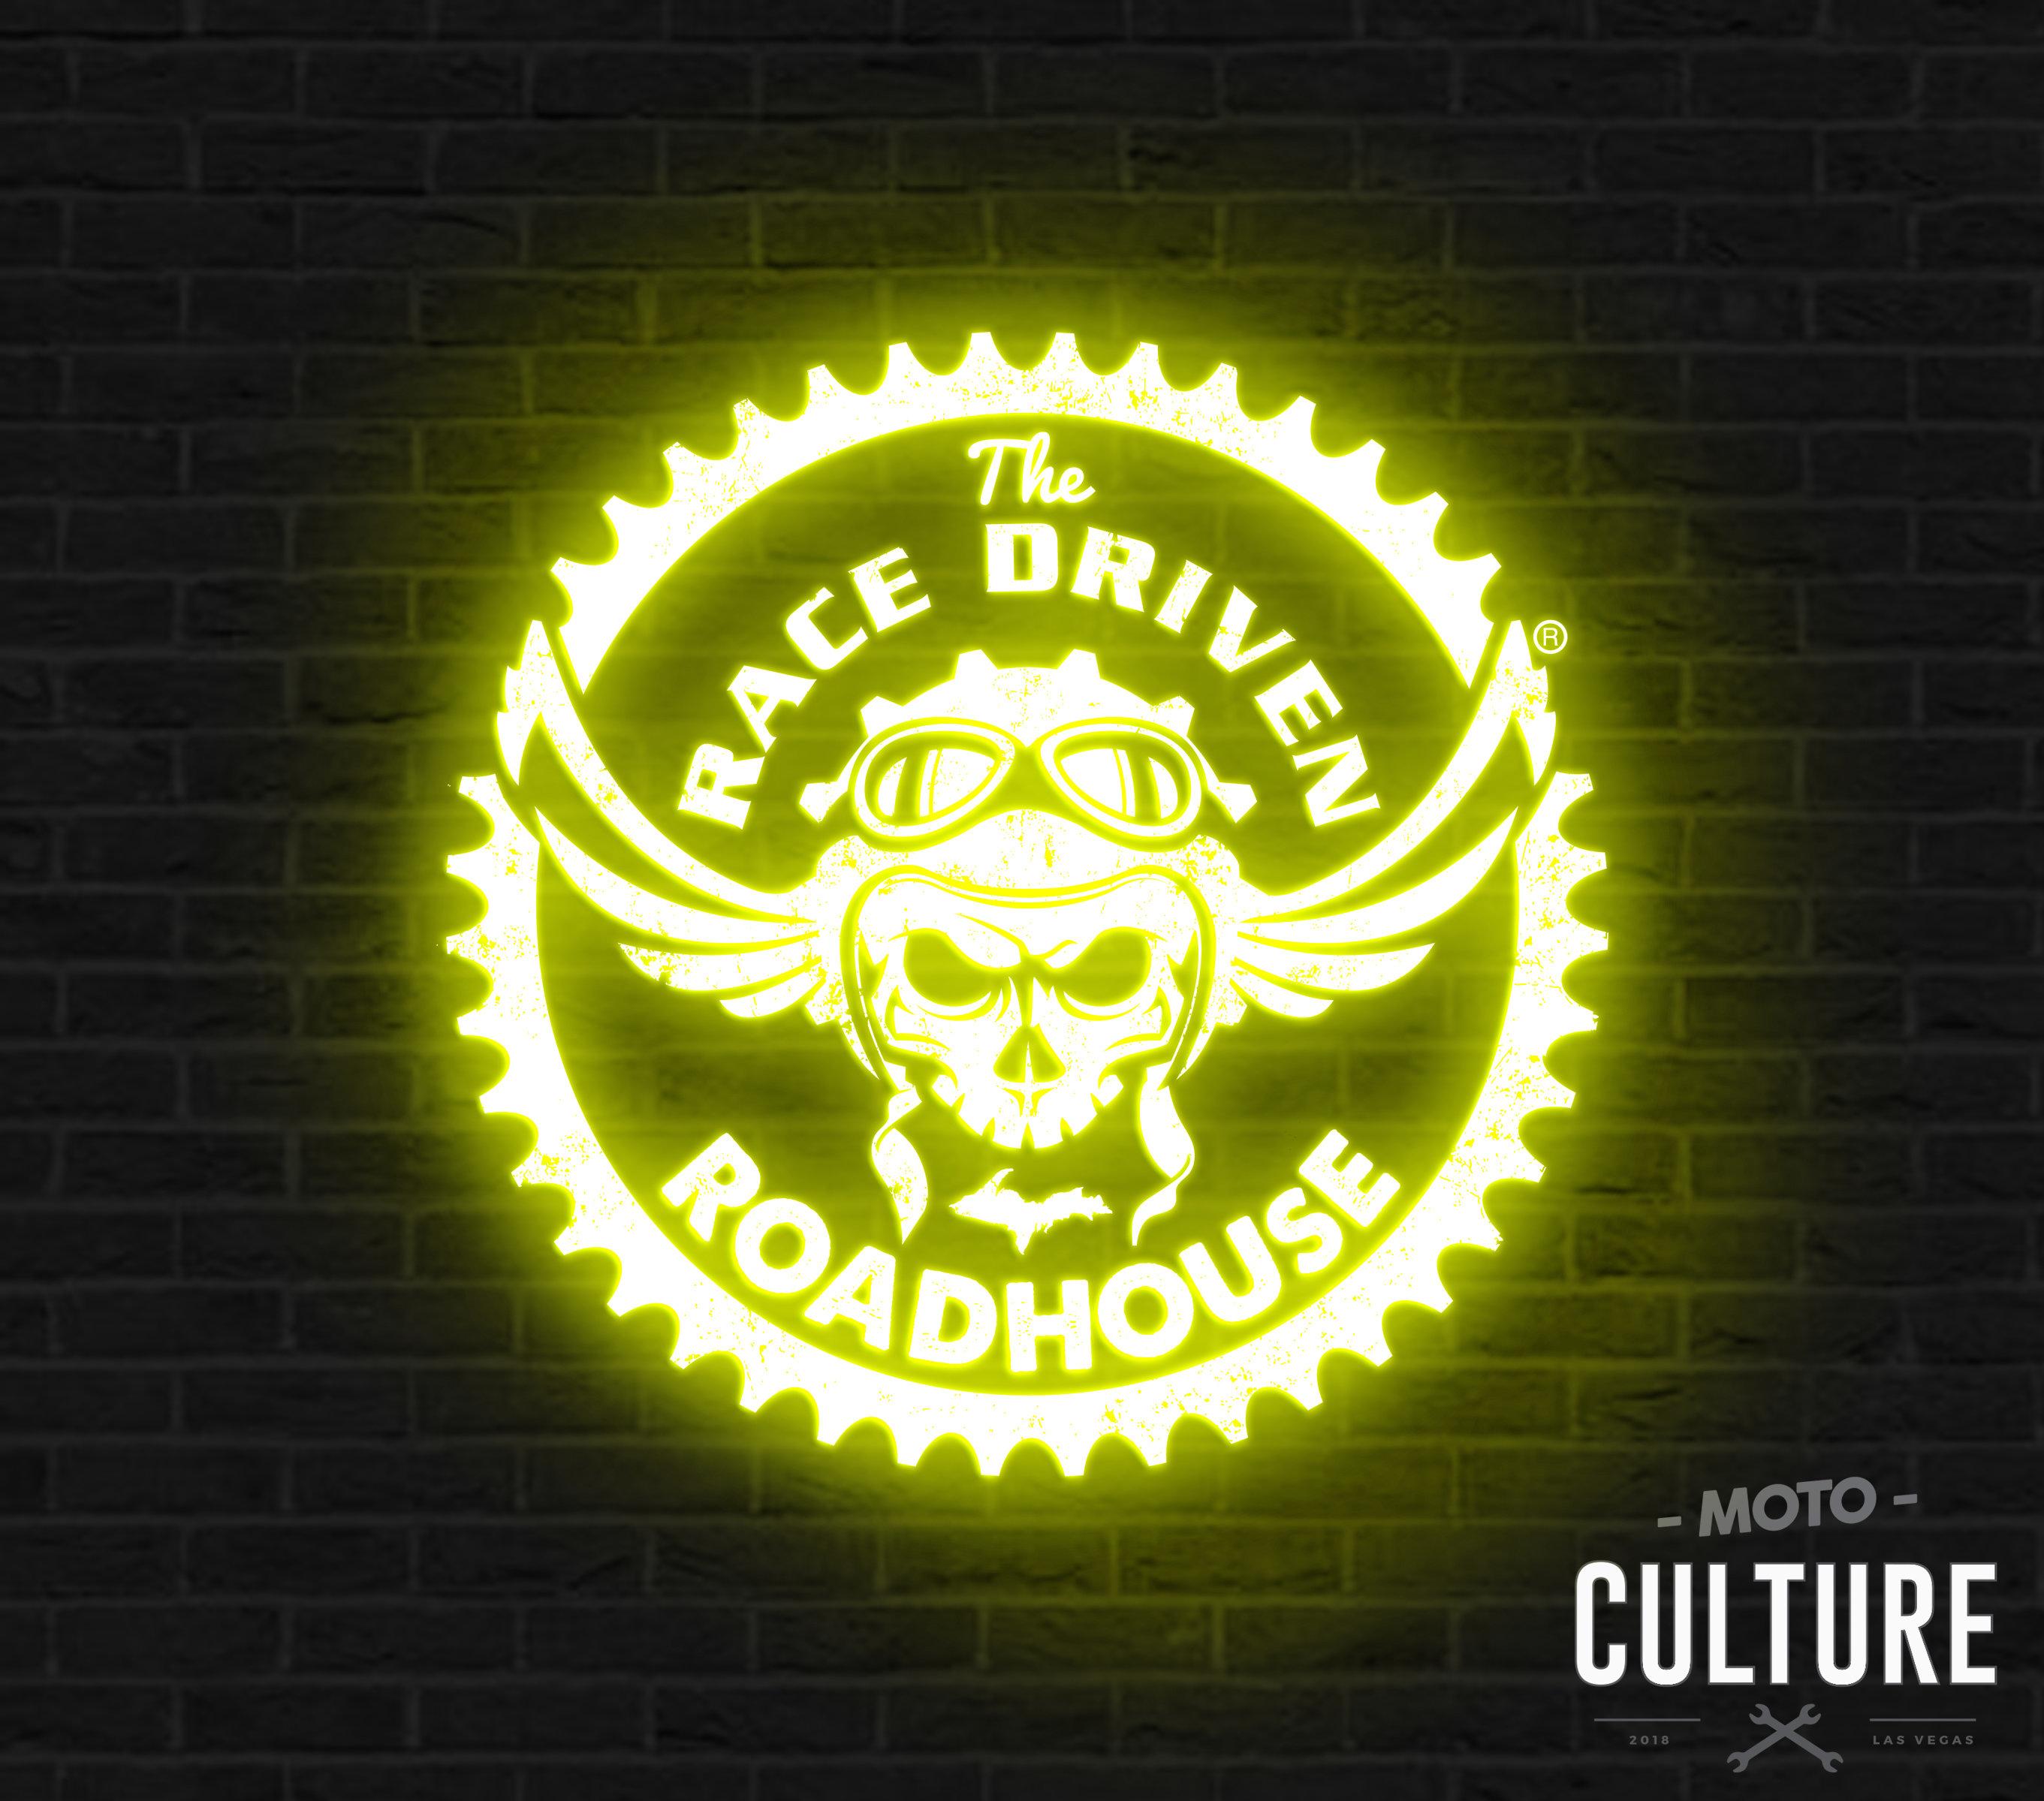 AIMExpo Moto Culture